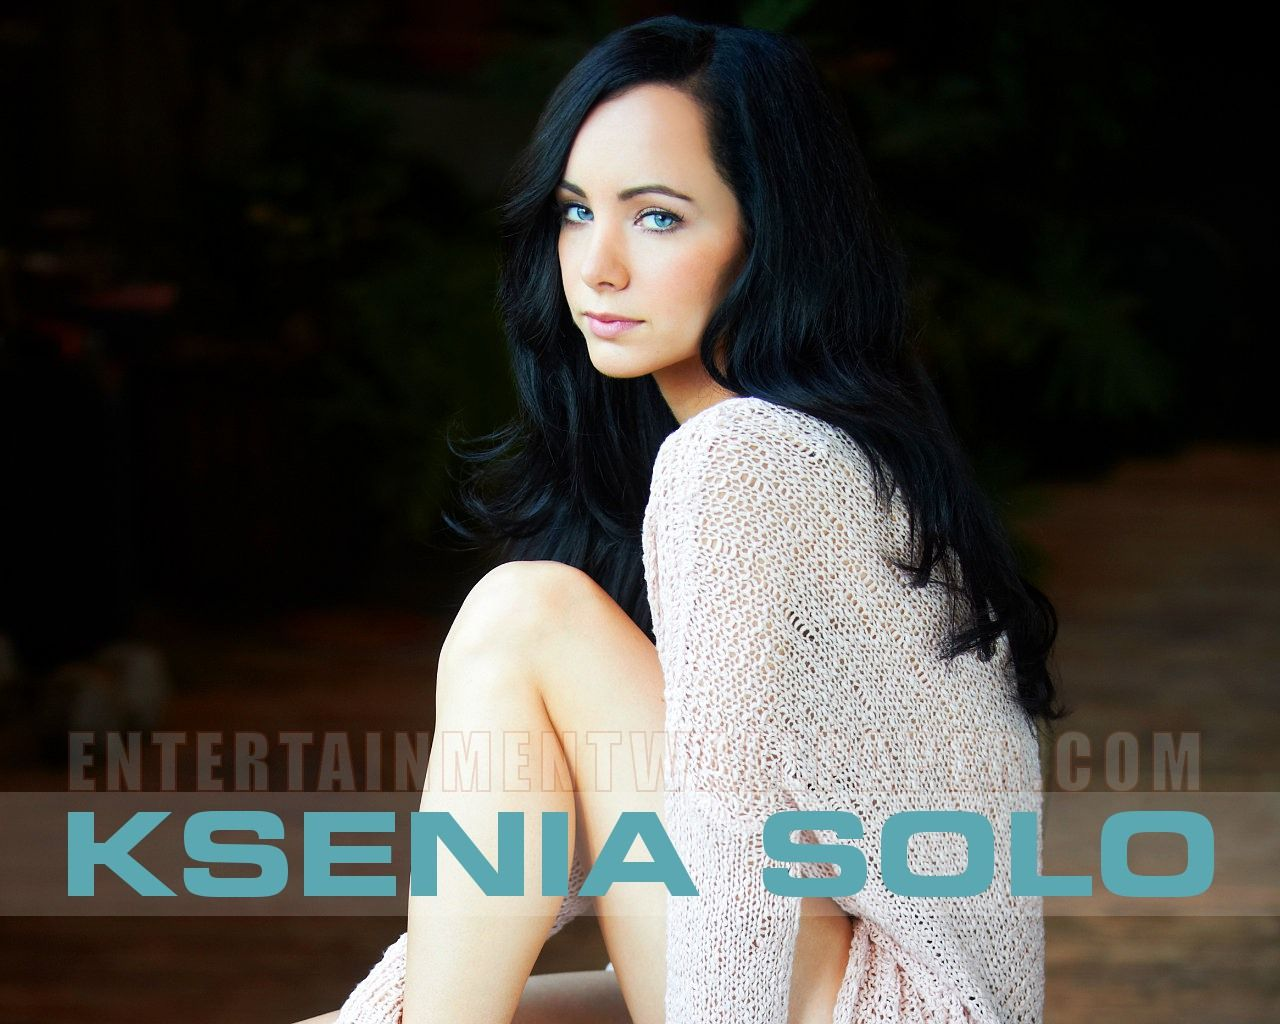 Ksenia Solo Wallpaper Bing Images Ksenia Solo Lost Girl Arm Warmers